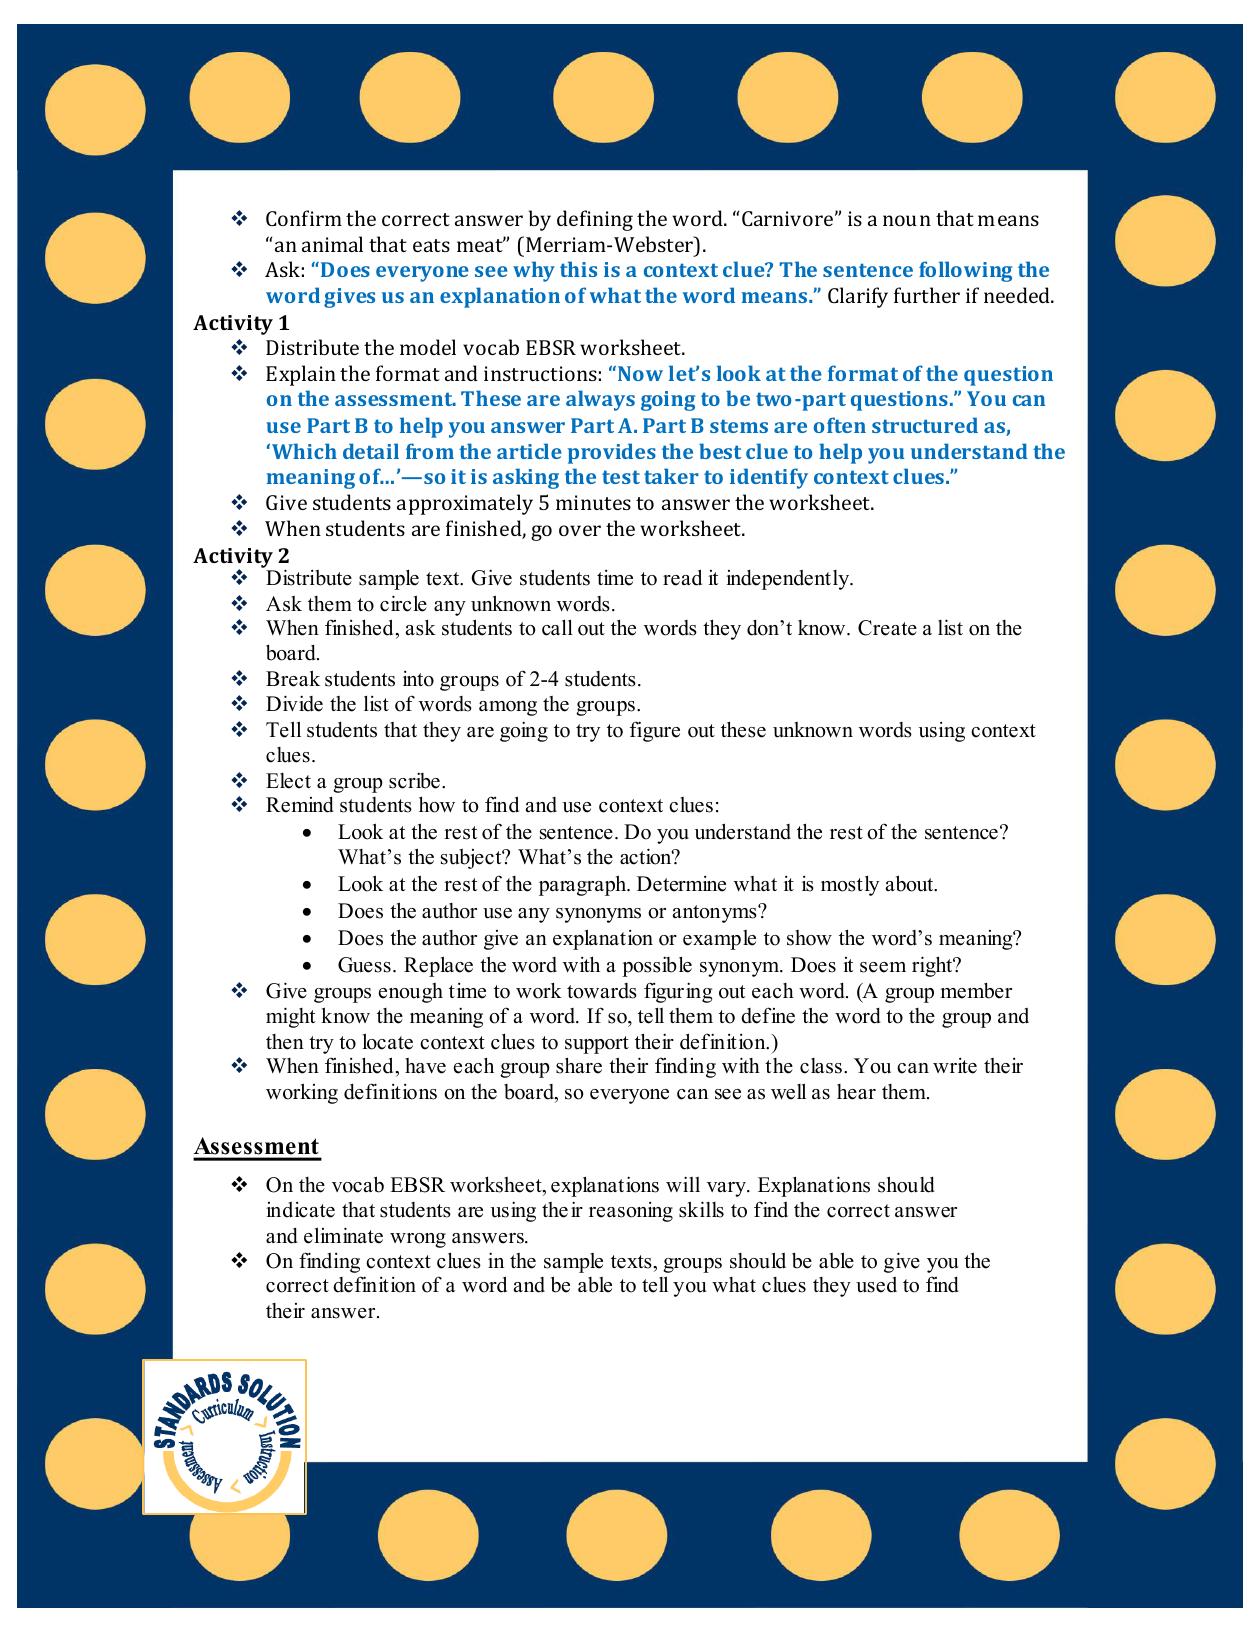 Parcc 8th Grade Reading Lesson Plan Samples Pg 3